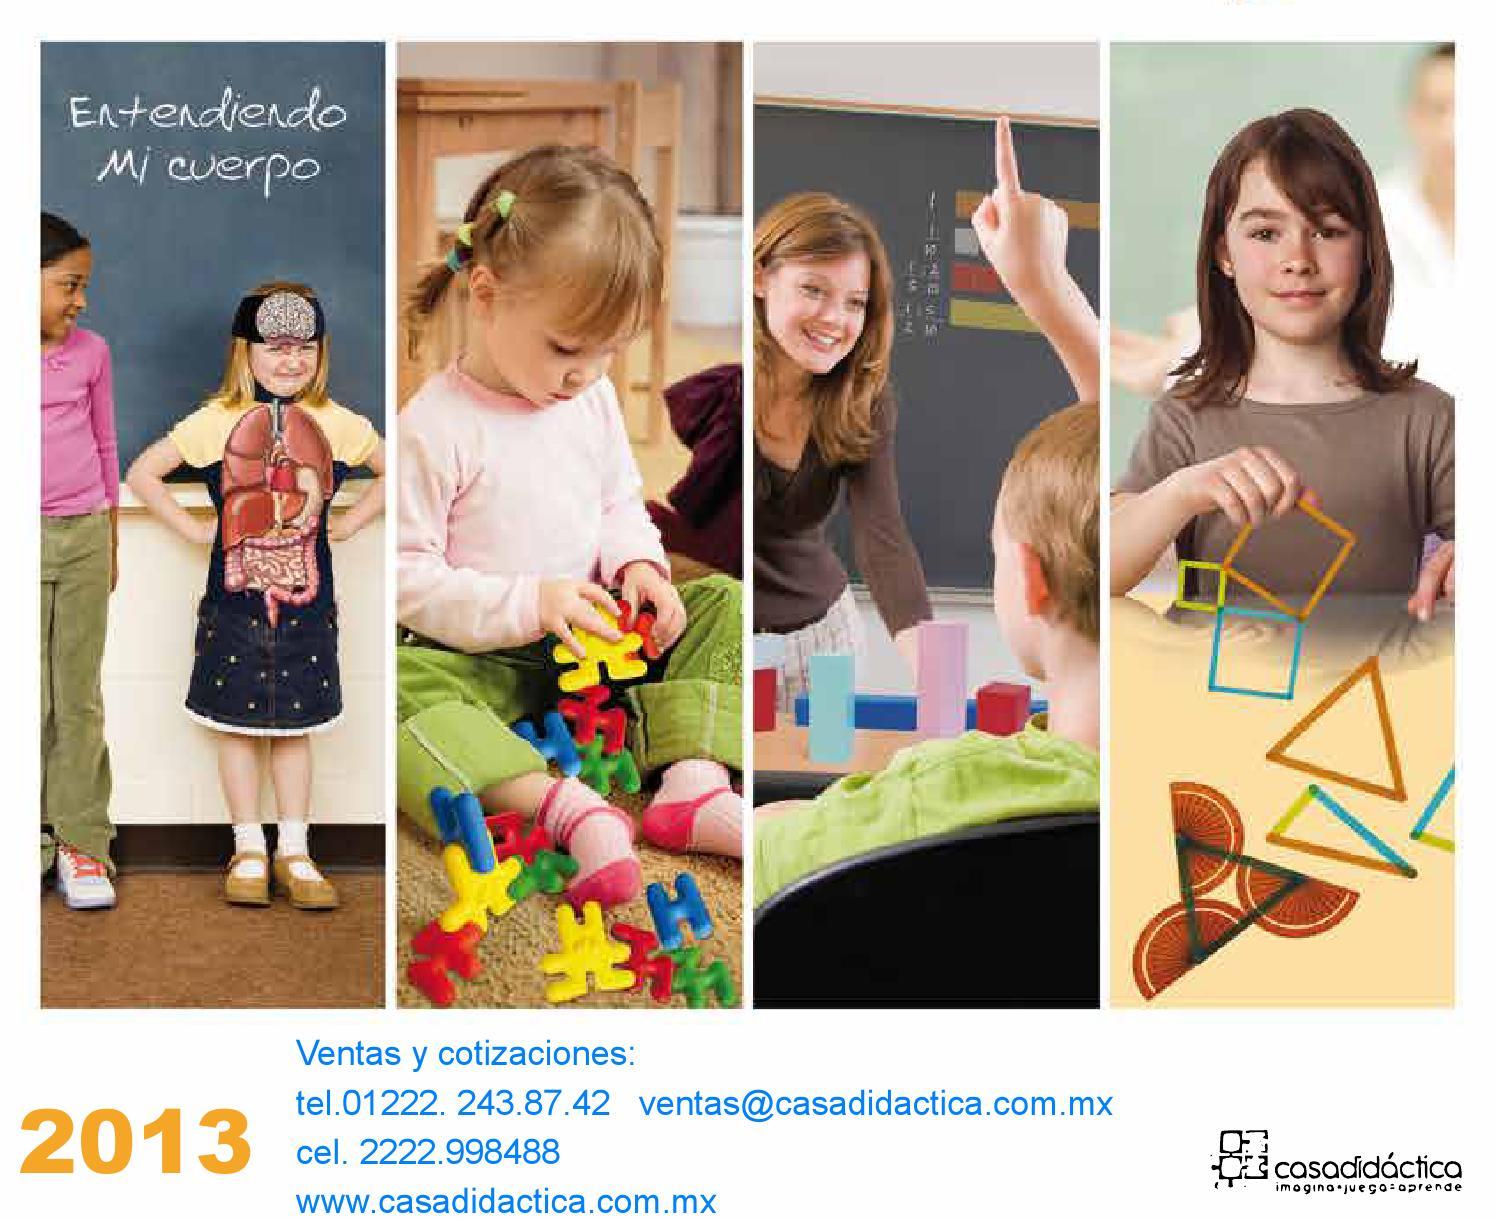 Catálogo Juguetes Educativos de PLASTICO by CASA DIDACTICA- IDEAS HANDS -  issuu d26545ac5783